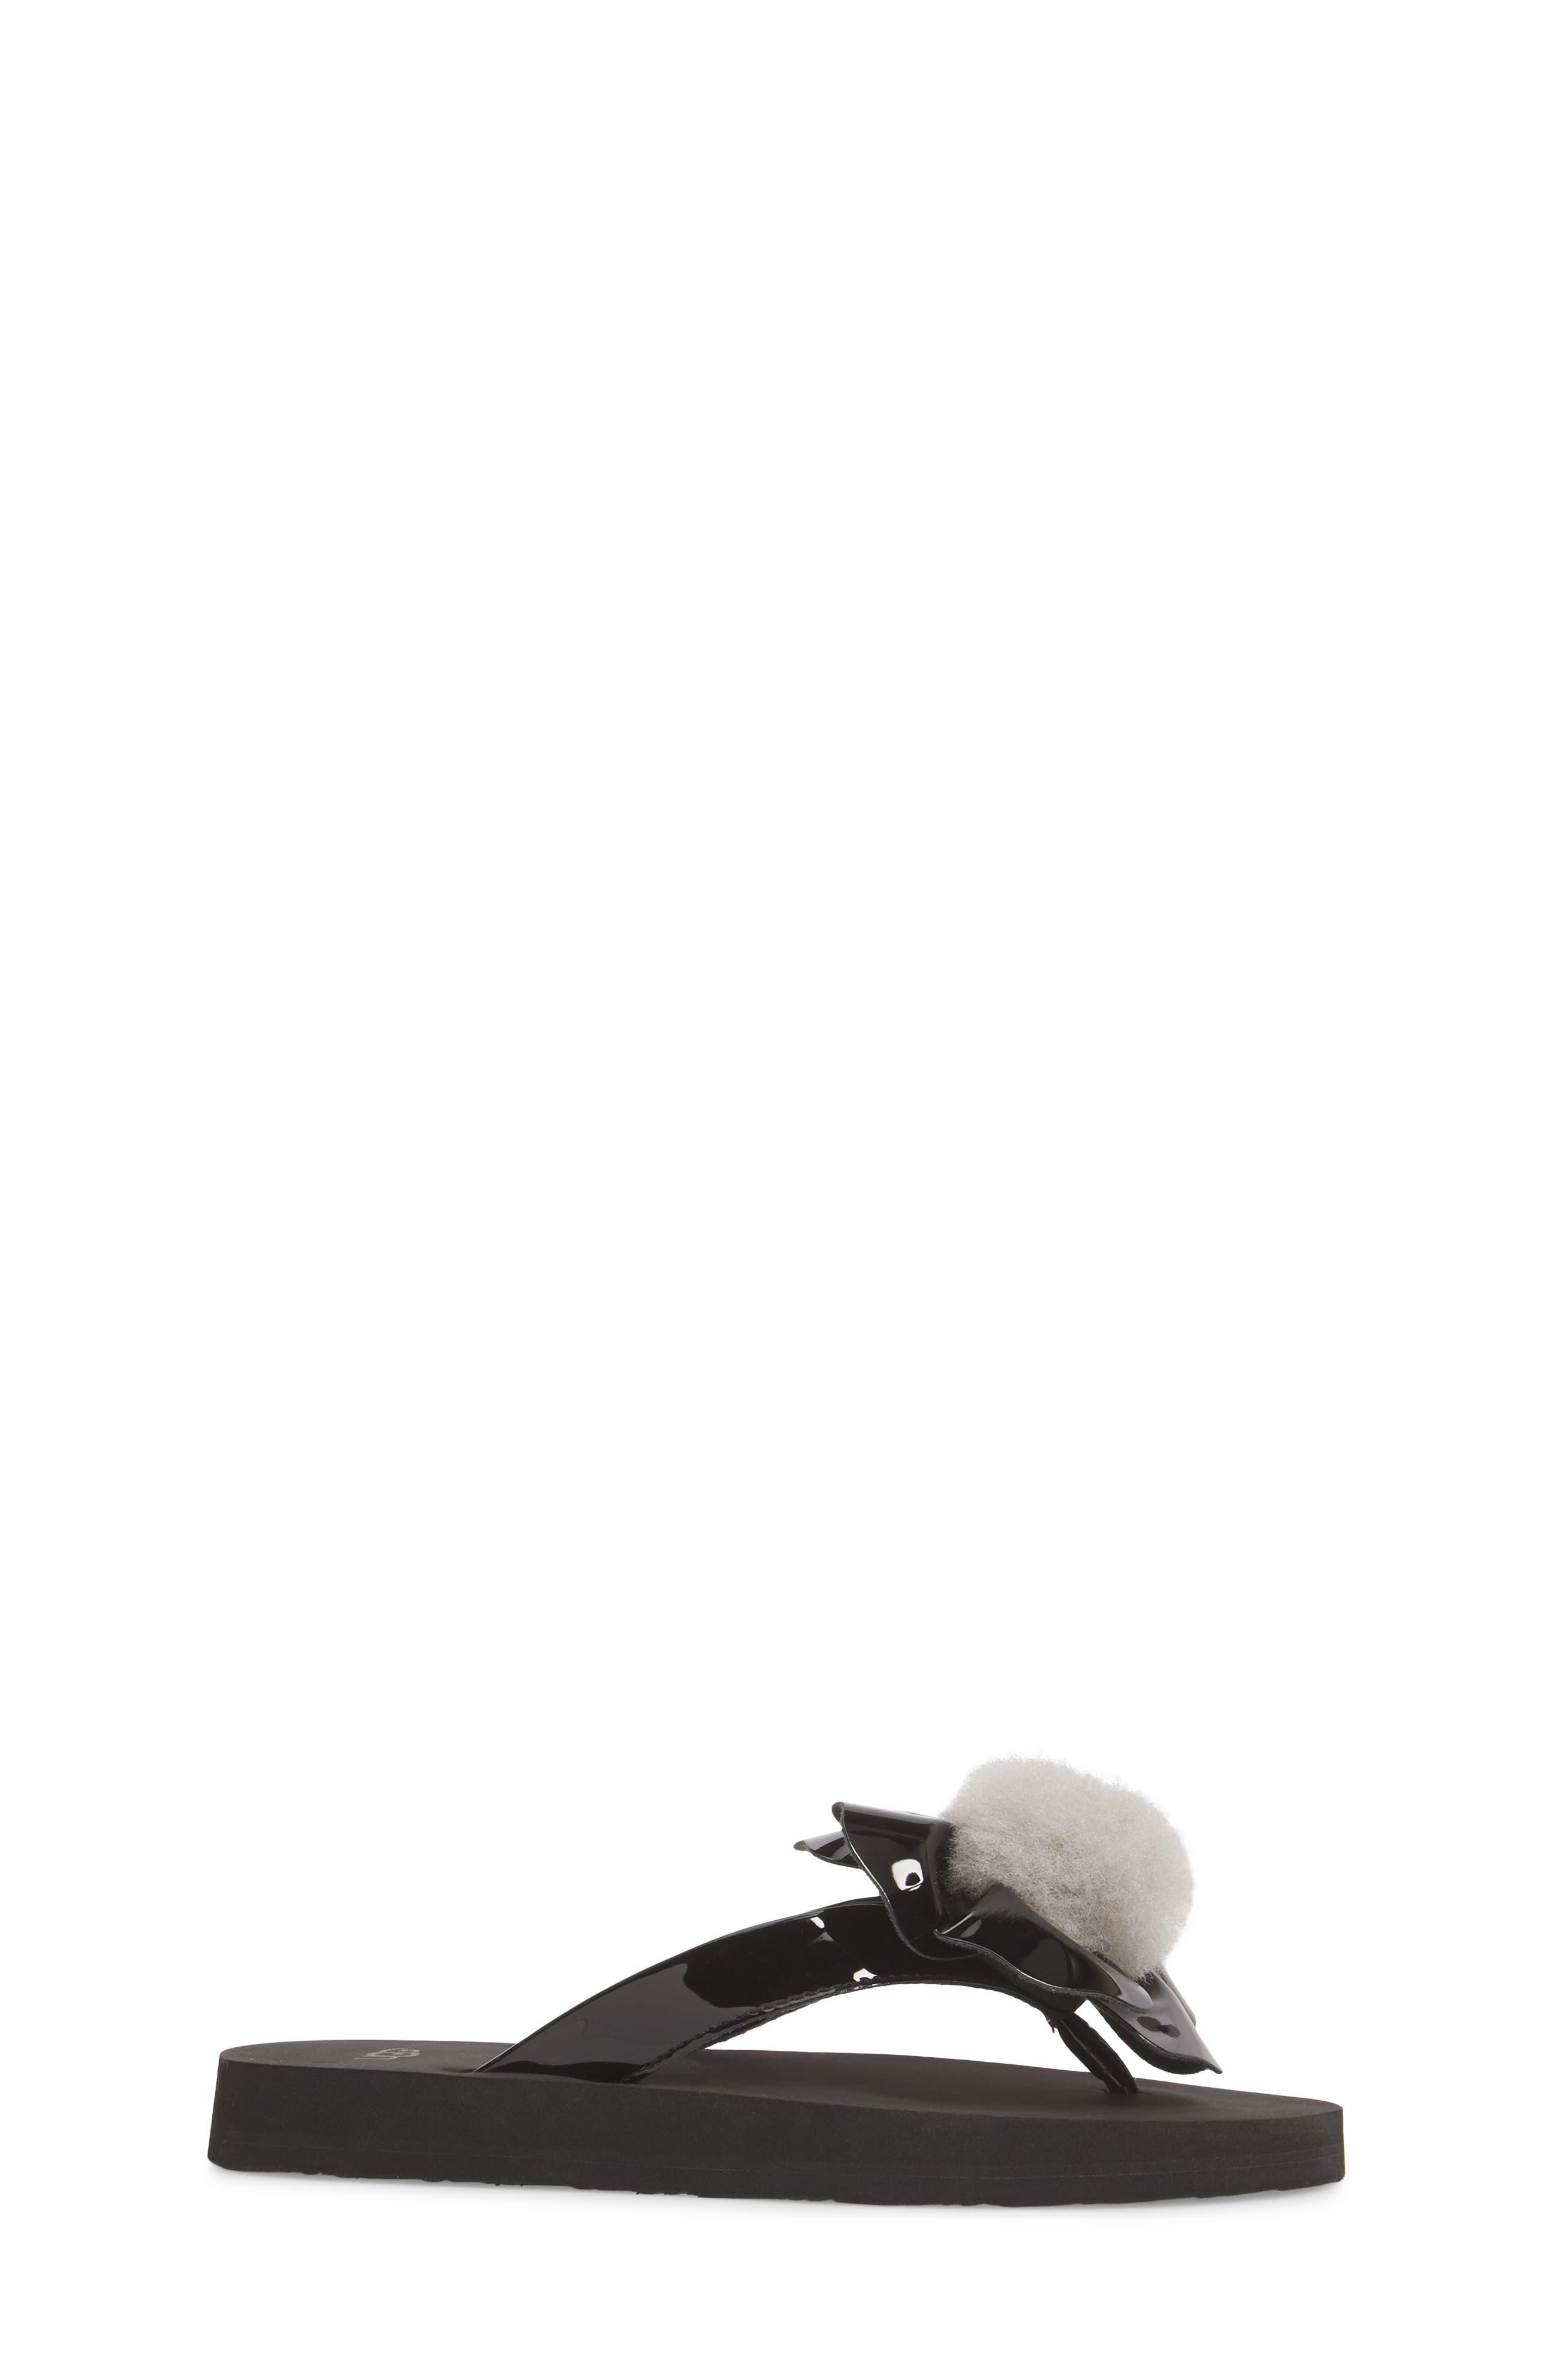 Poppy Genuine Shearling Flip Flop,                             Alternate thumbnail 3, color,                             Black